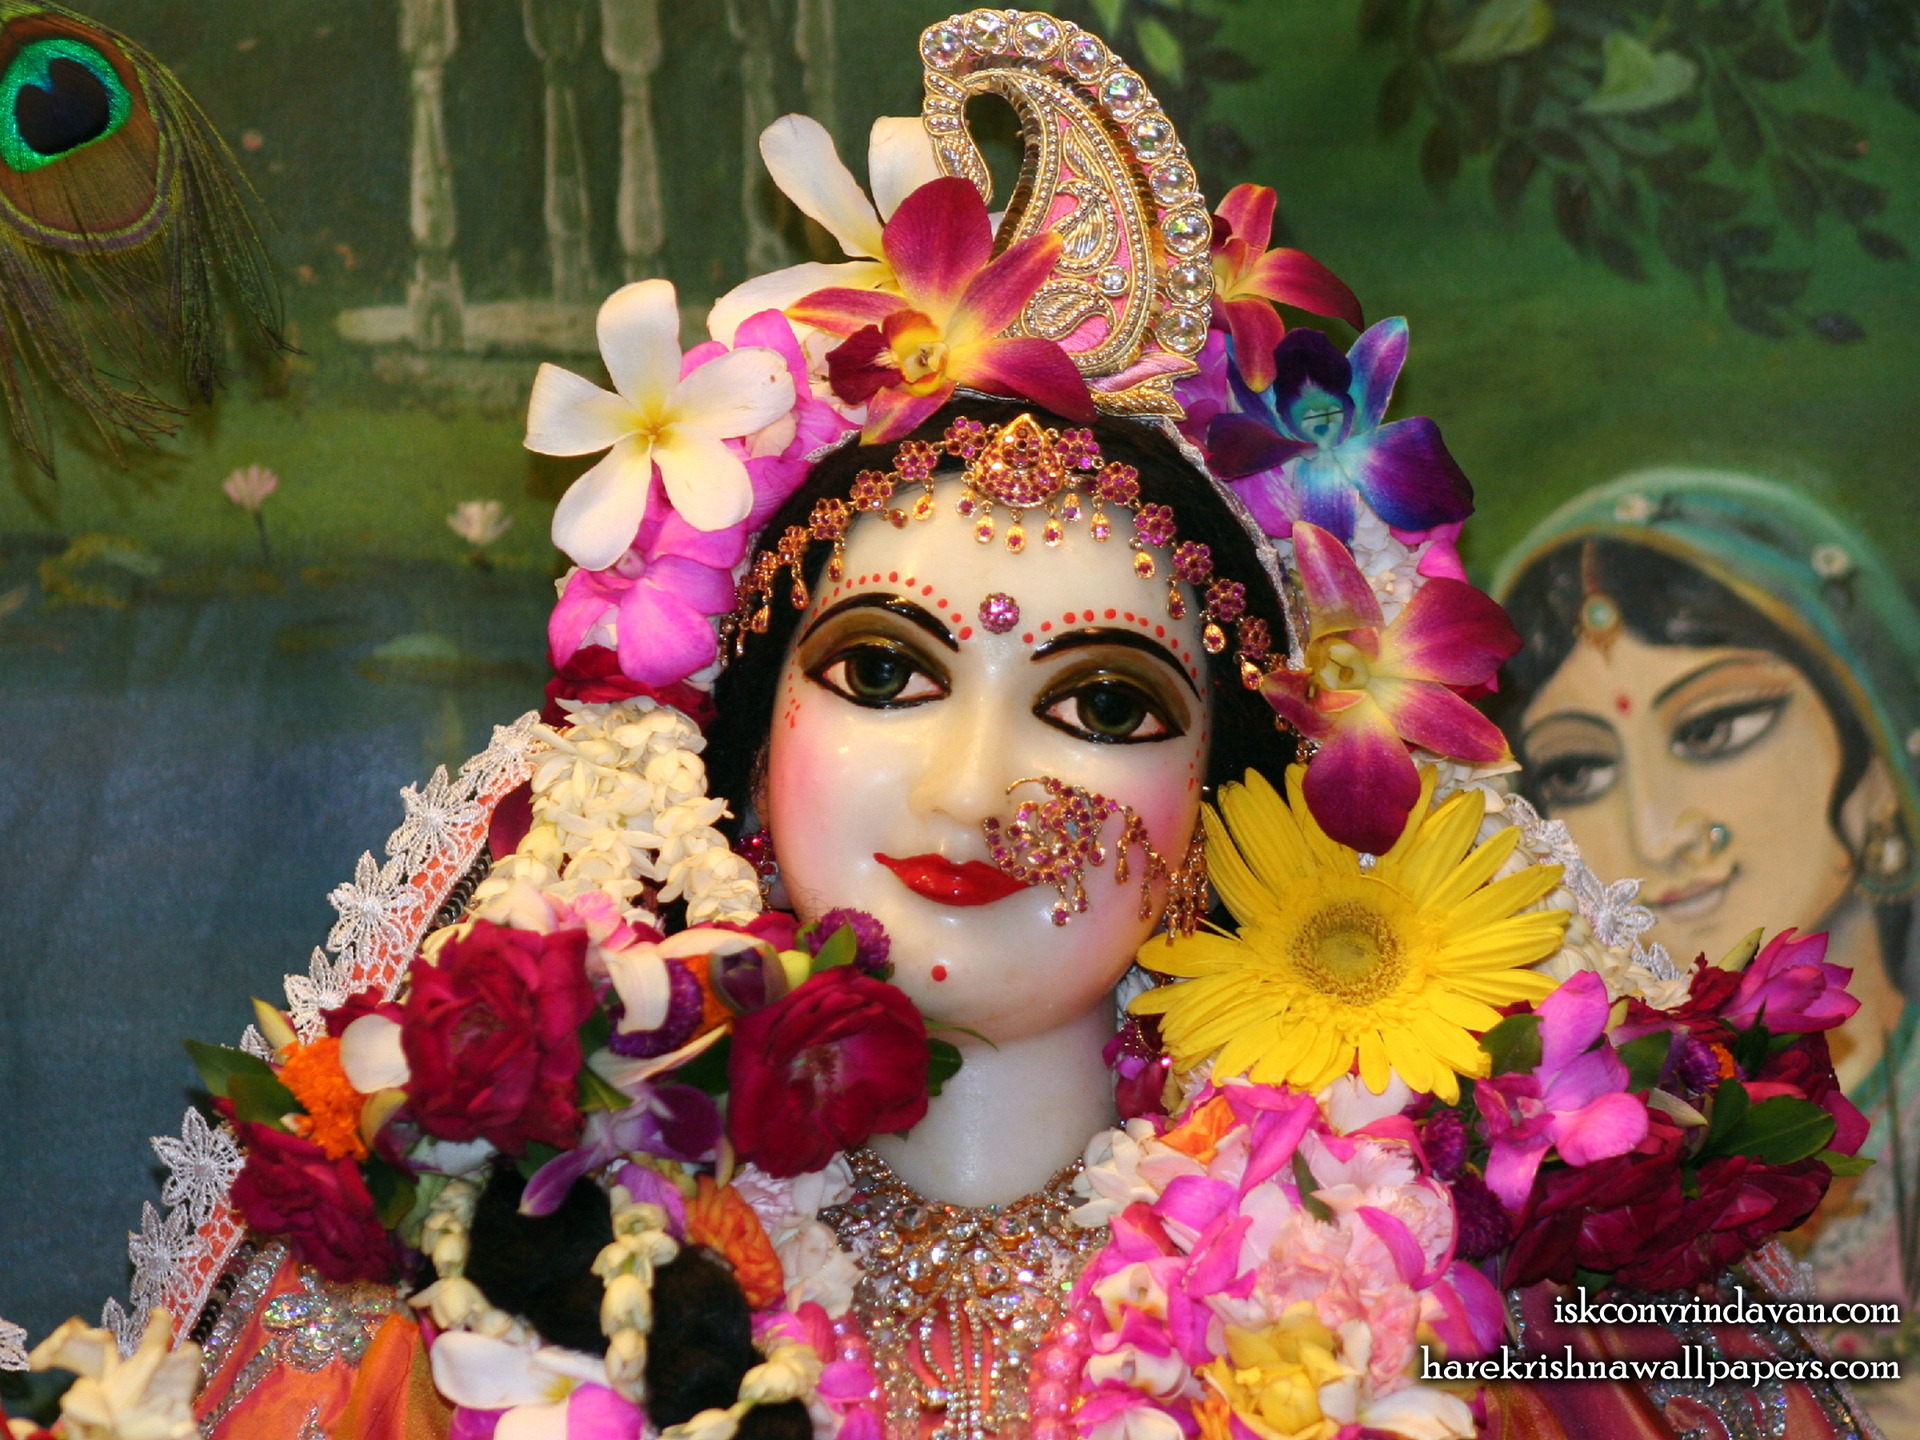 Sri Radha Close up Wallpaper (022) Size 1920x1440 Download